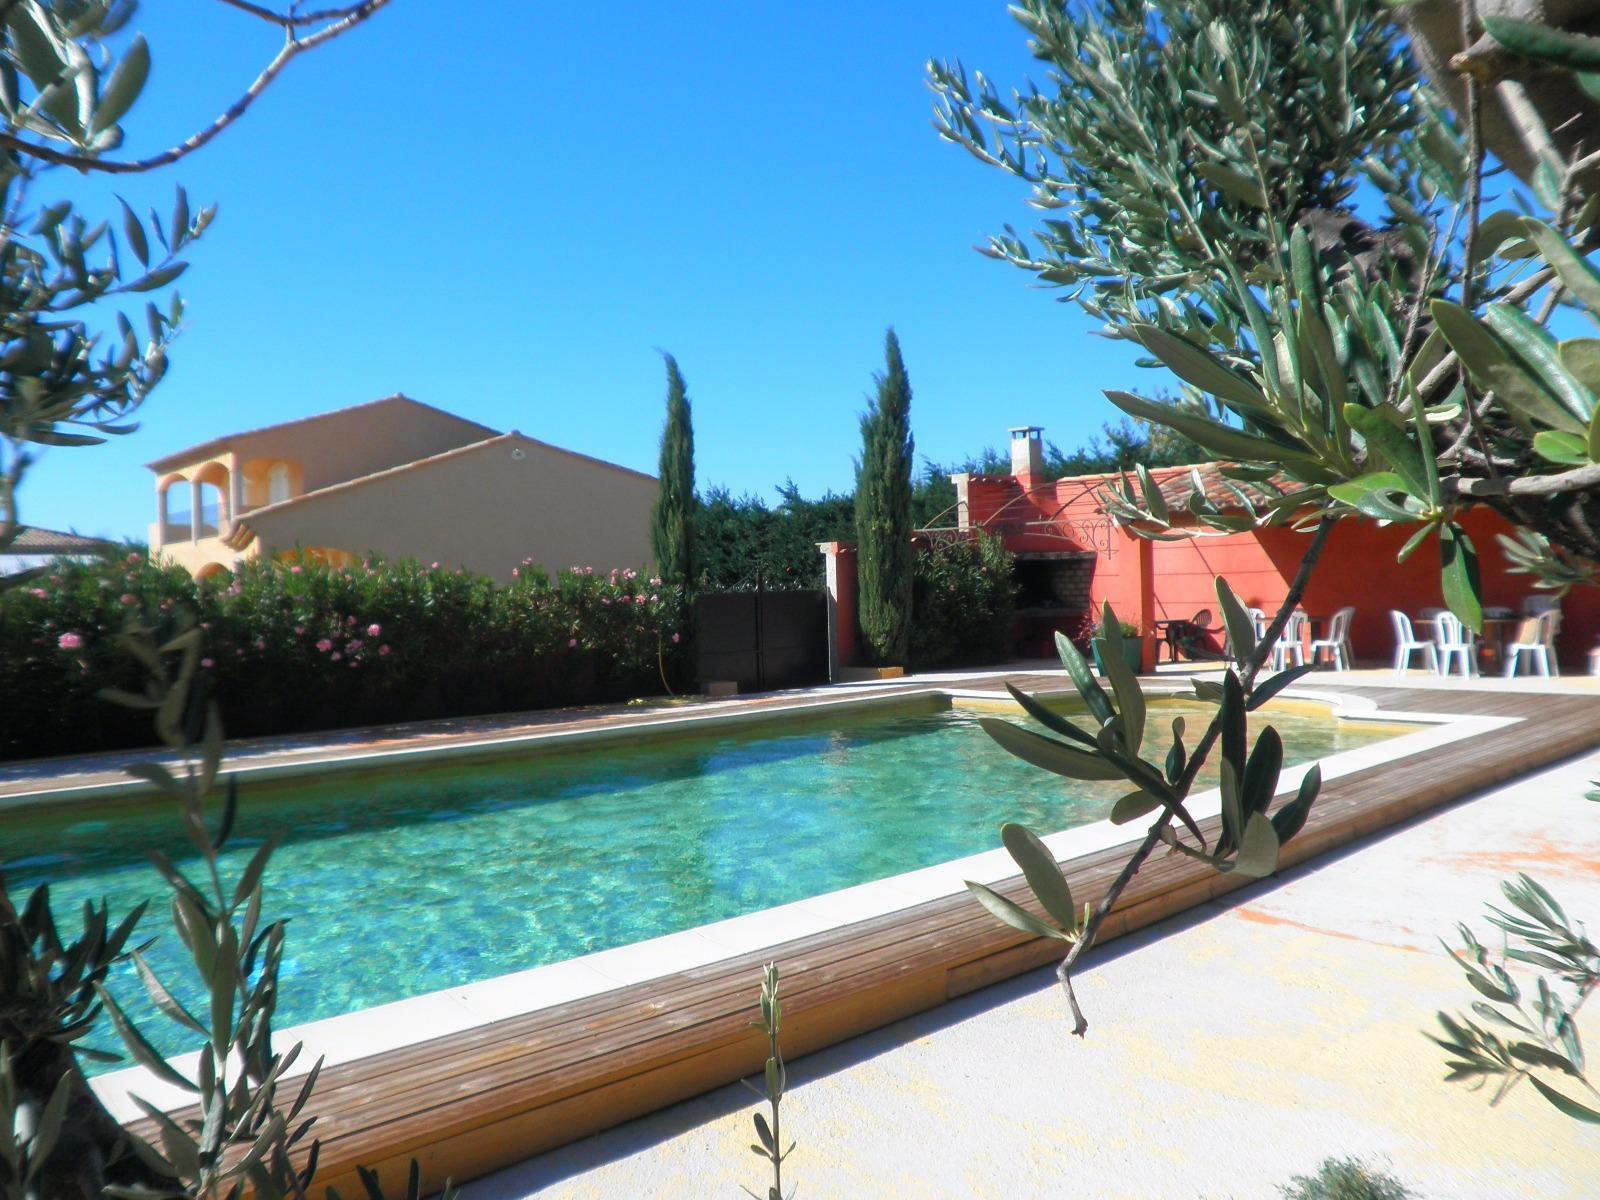 Annonce villa 8 pieces vaison la romaine vente for Prix piscine 12x6